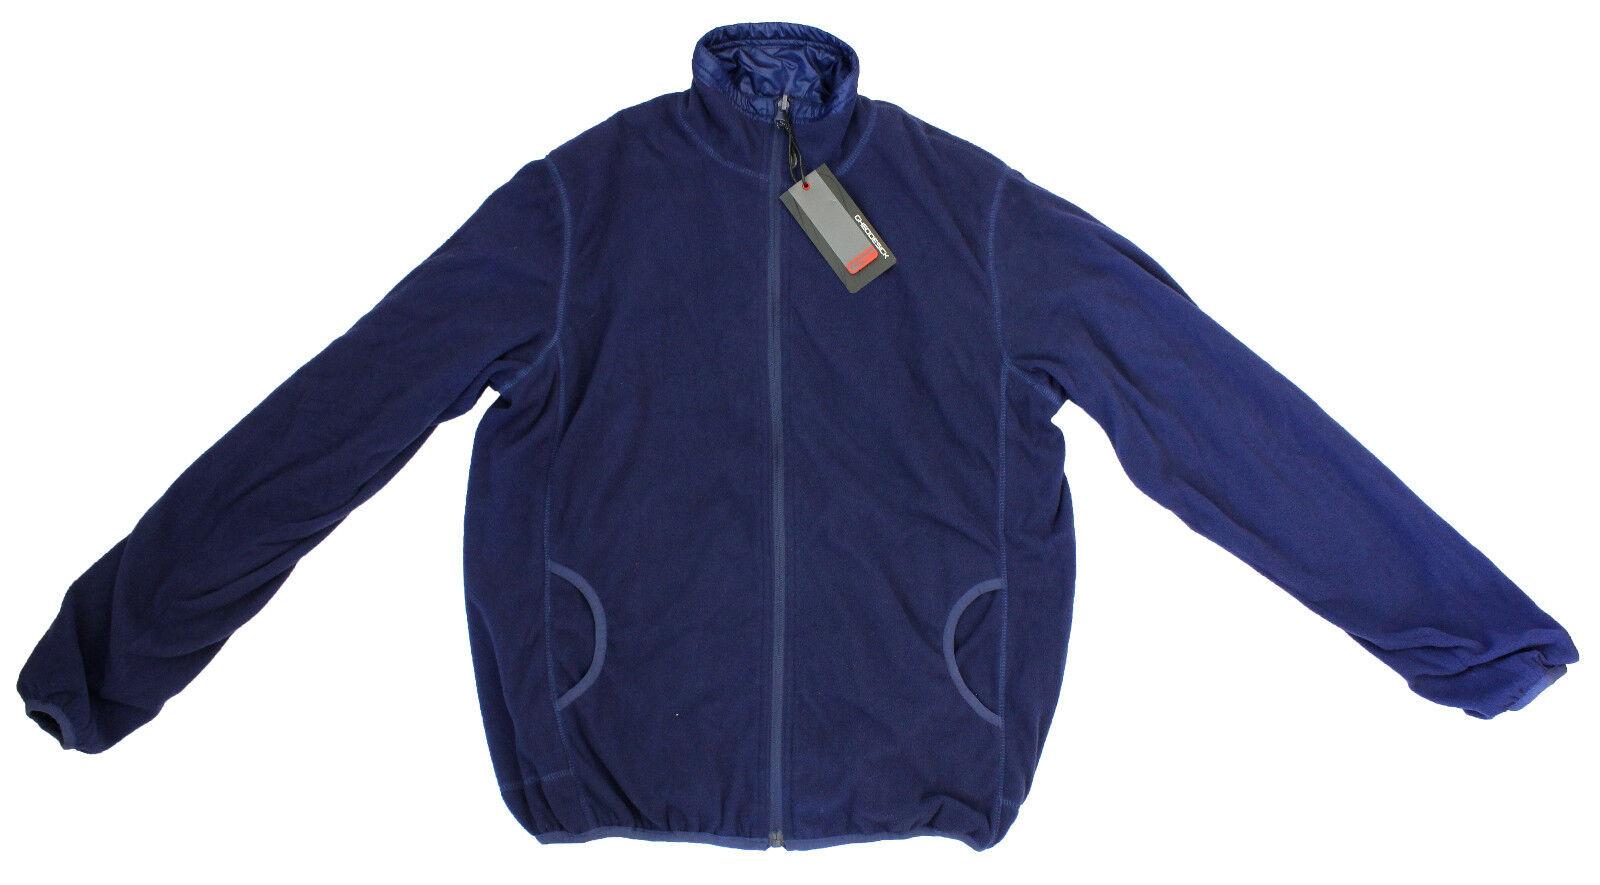 GHEODESICK sweatshirt blu Uomo felpa uomo blu taglia M cod. 664018 G _